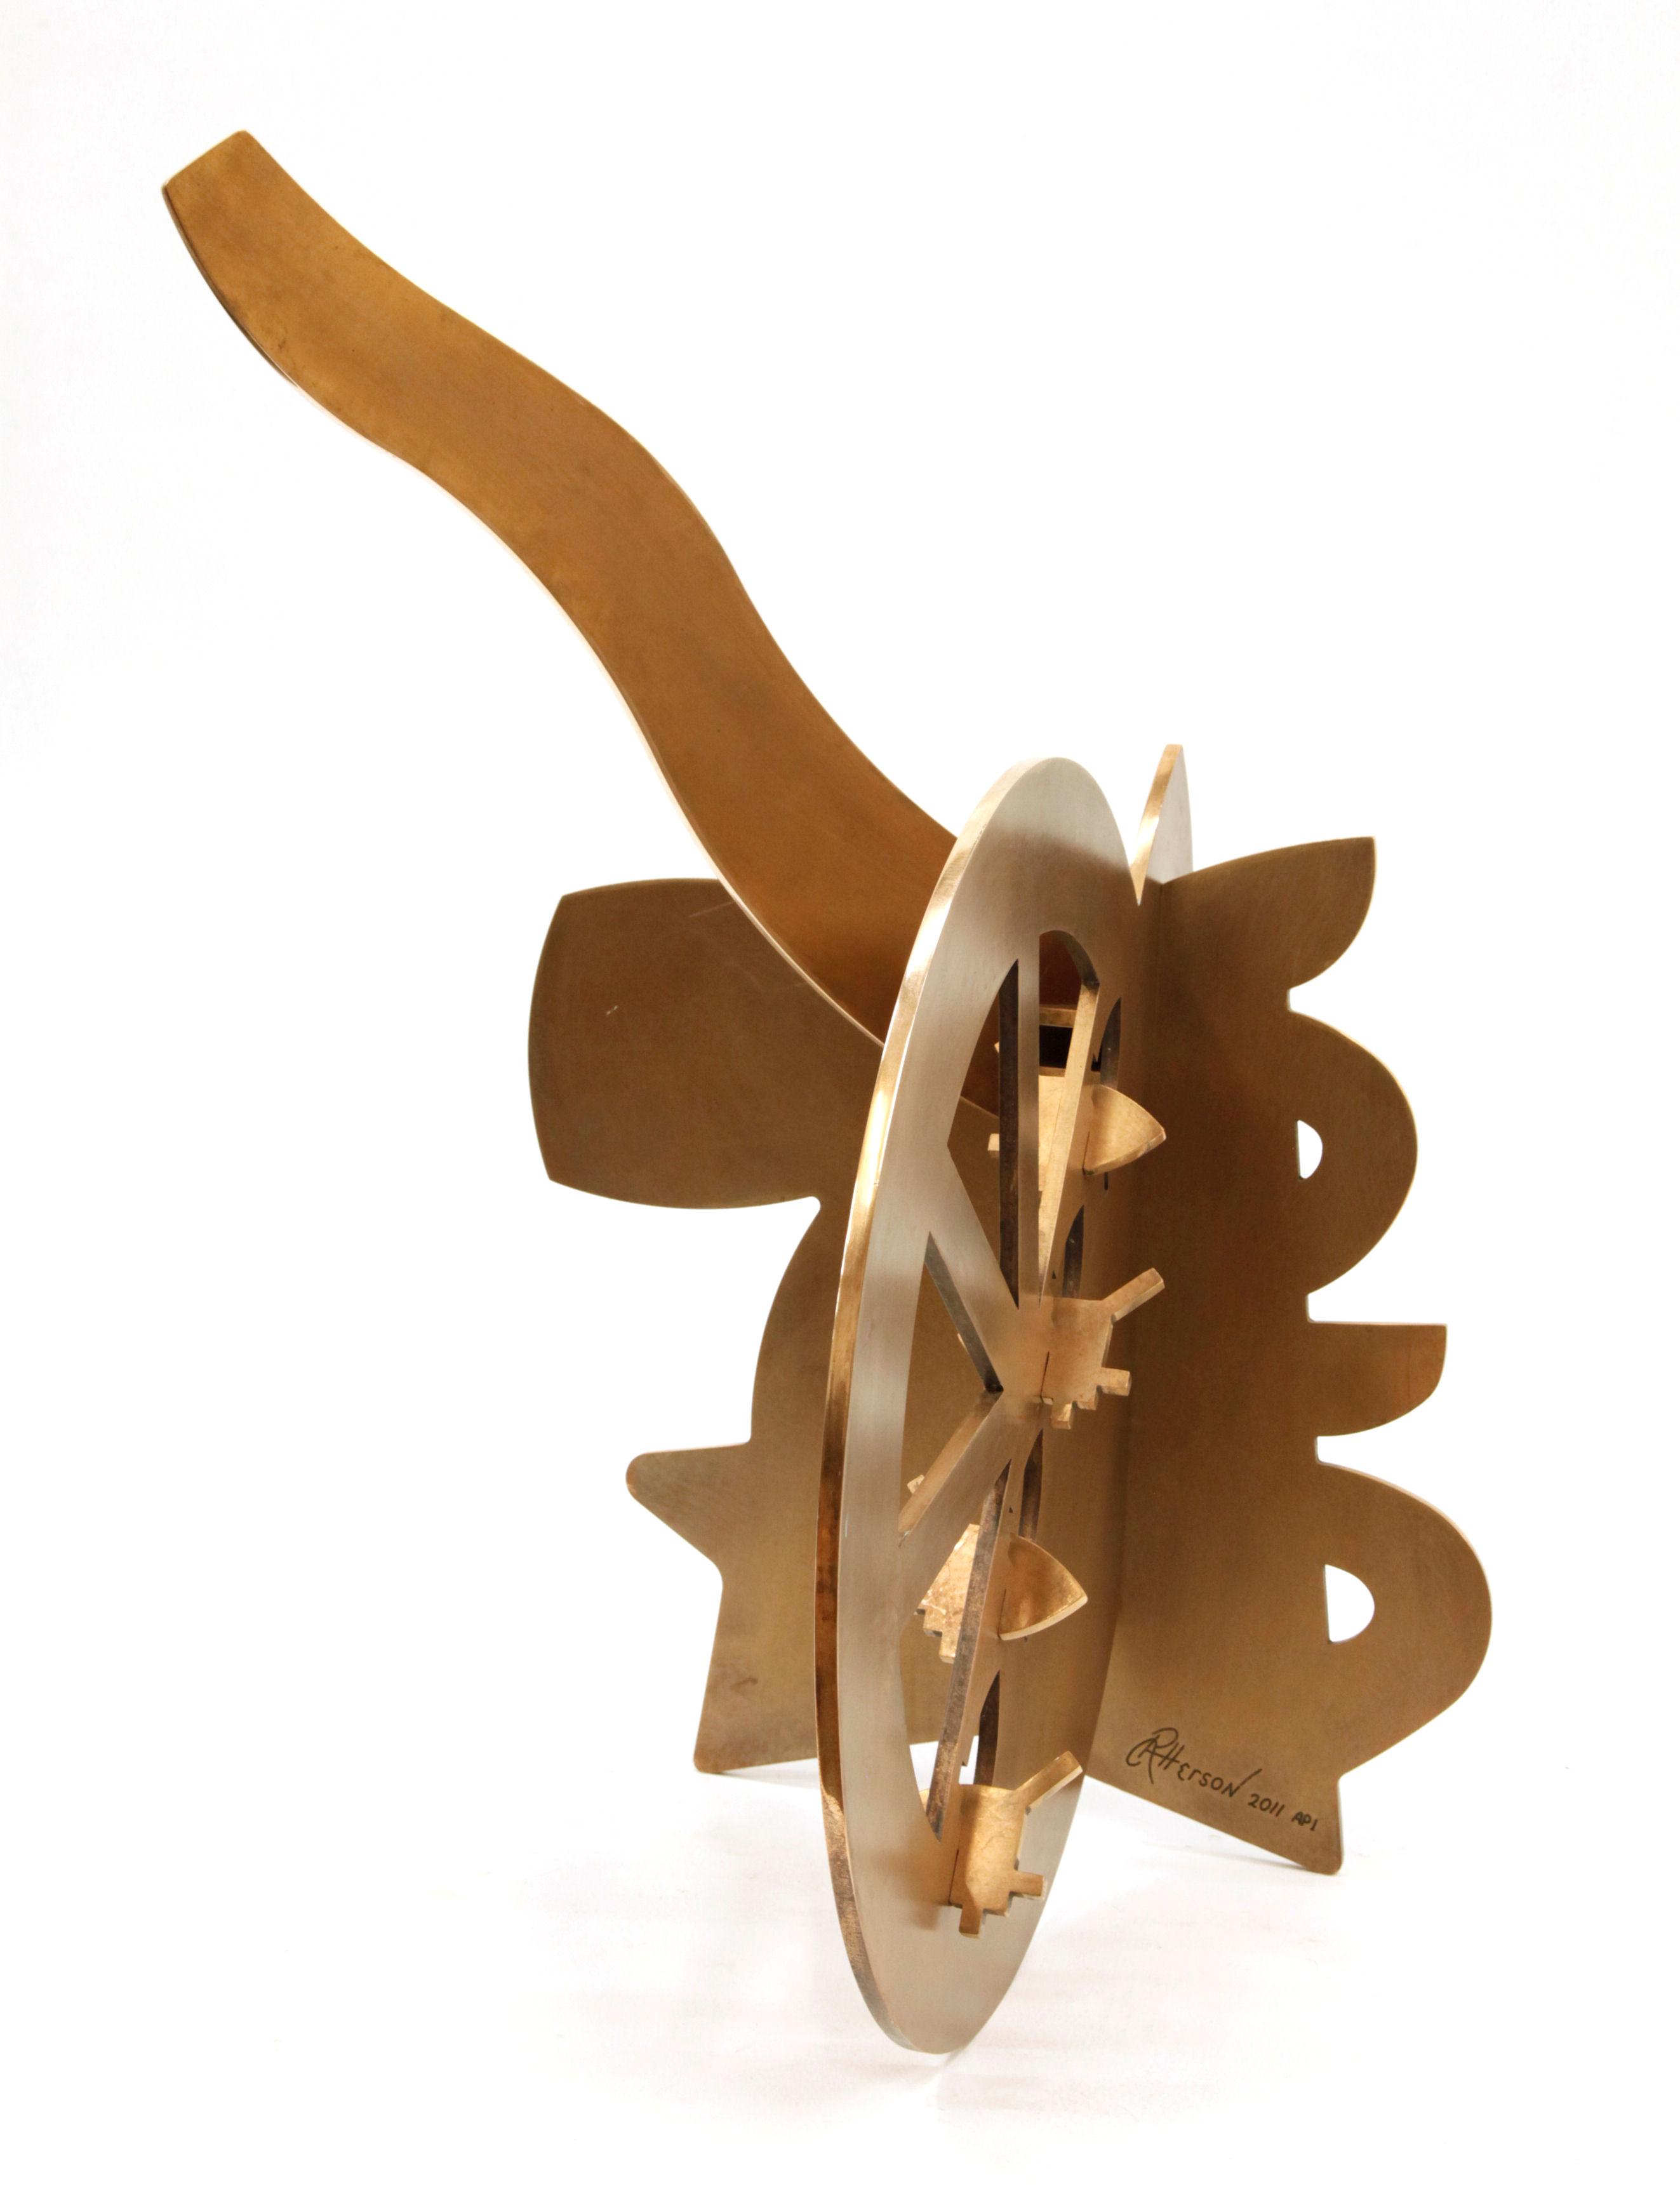 "Shungo Rising - 2011, Fabricated Bronze with Patina, 20"" x 34"" x 38"""